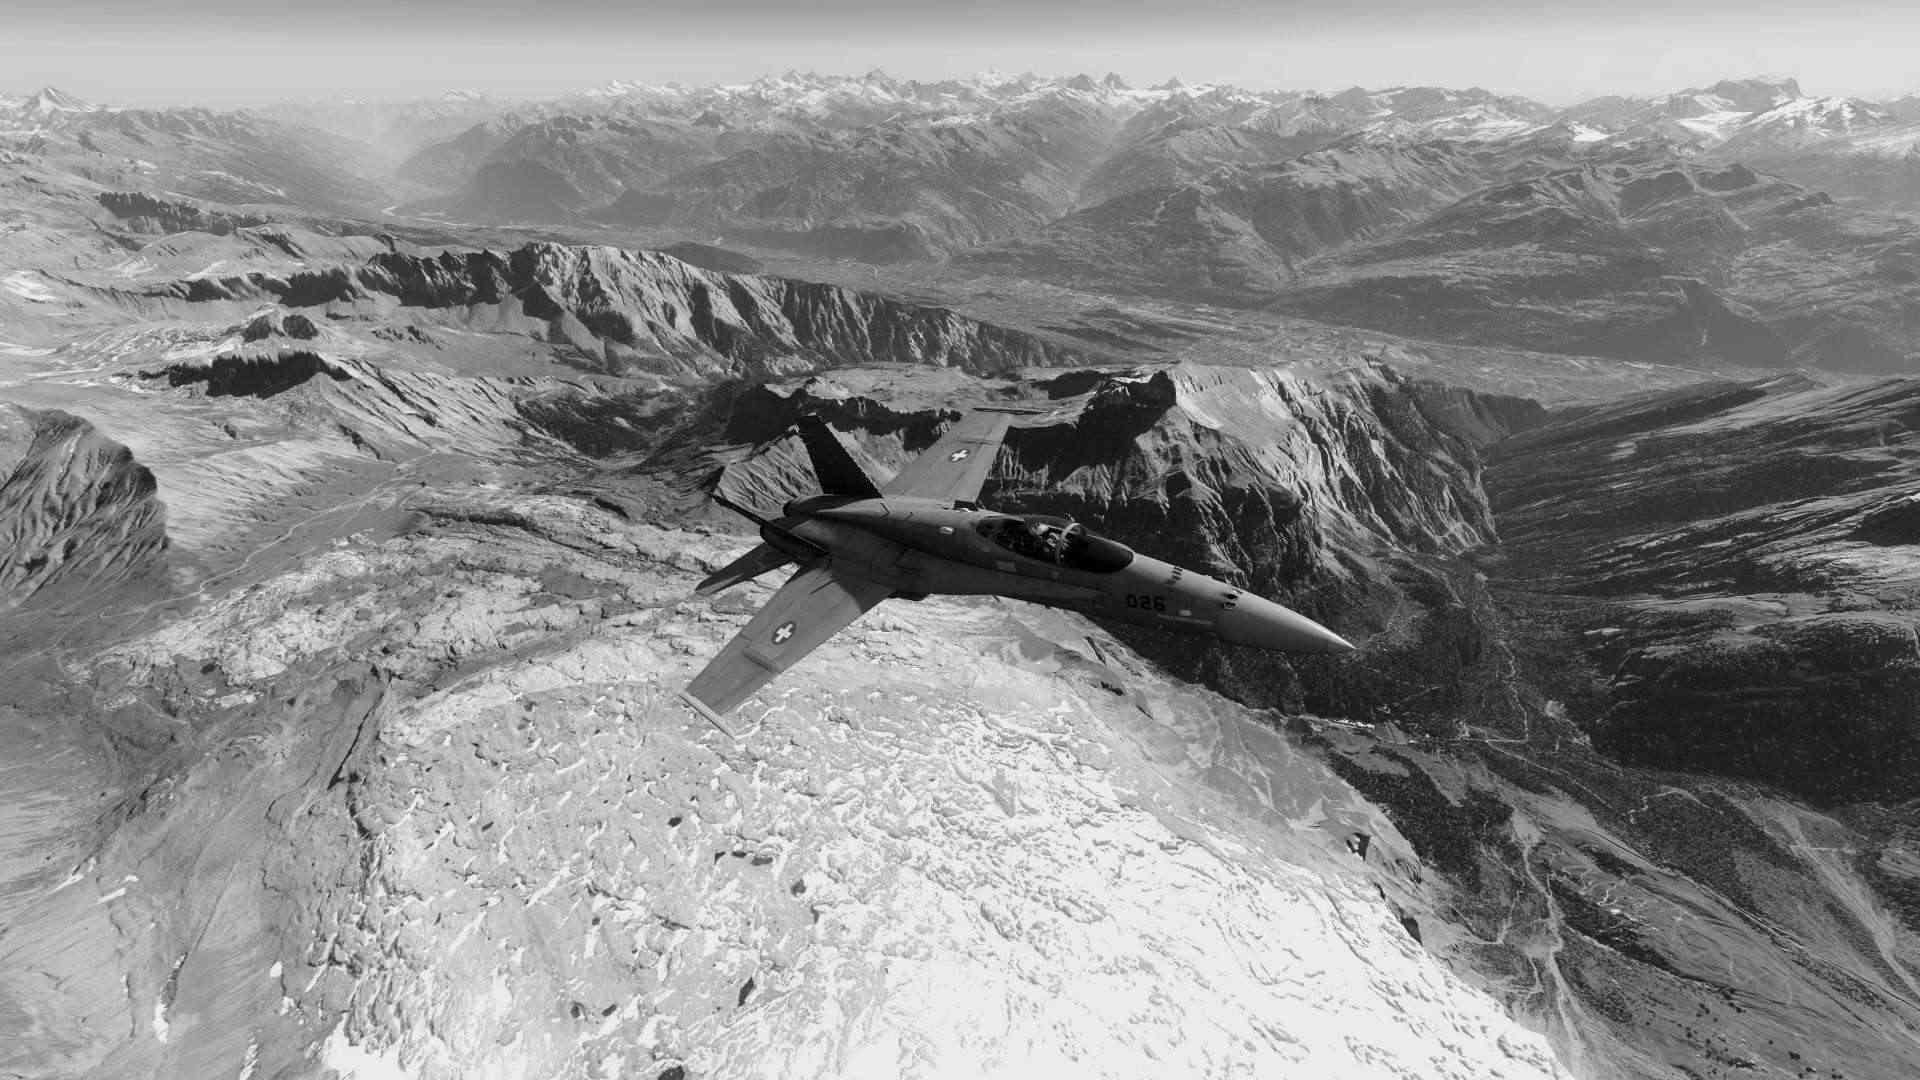 Meilleur que FSX : Aerofly FS - Page 2 Aerofl10